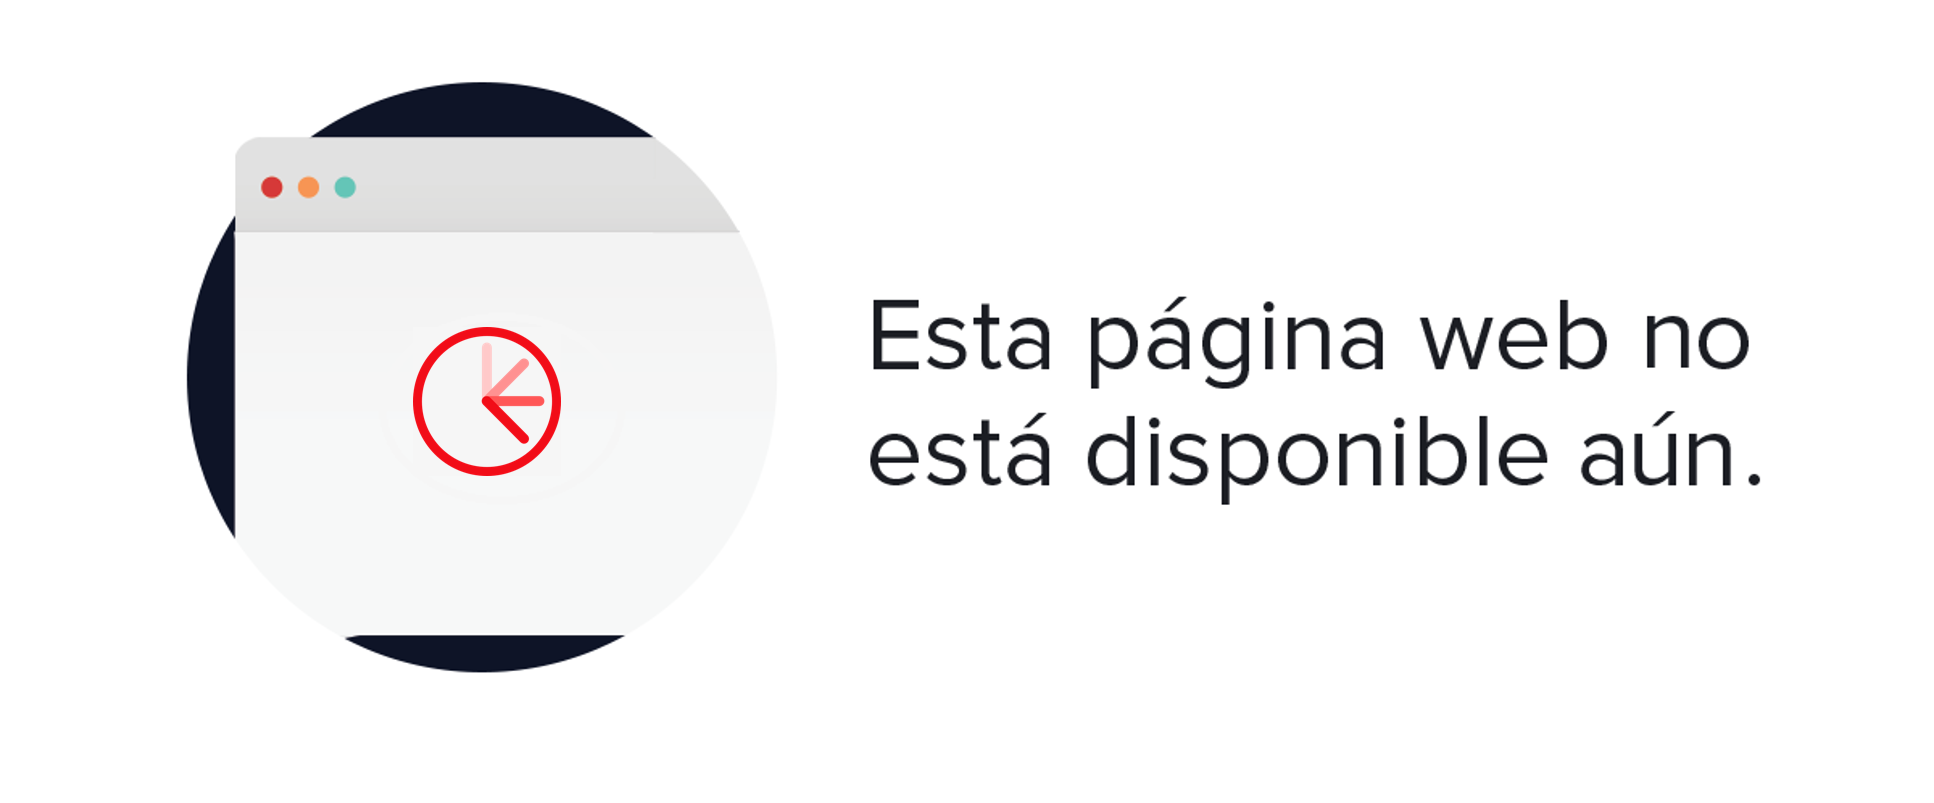 OXXO - Falda de mujer OXXO corta con bajo deshilachado Blanco 8681613245693 - WDYIBJF